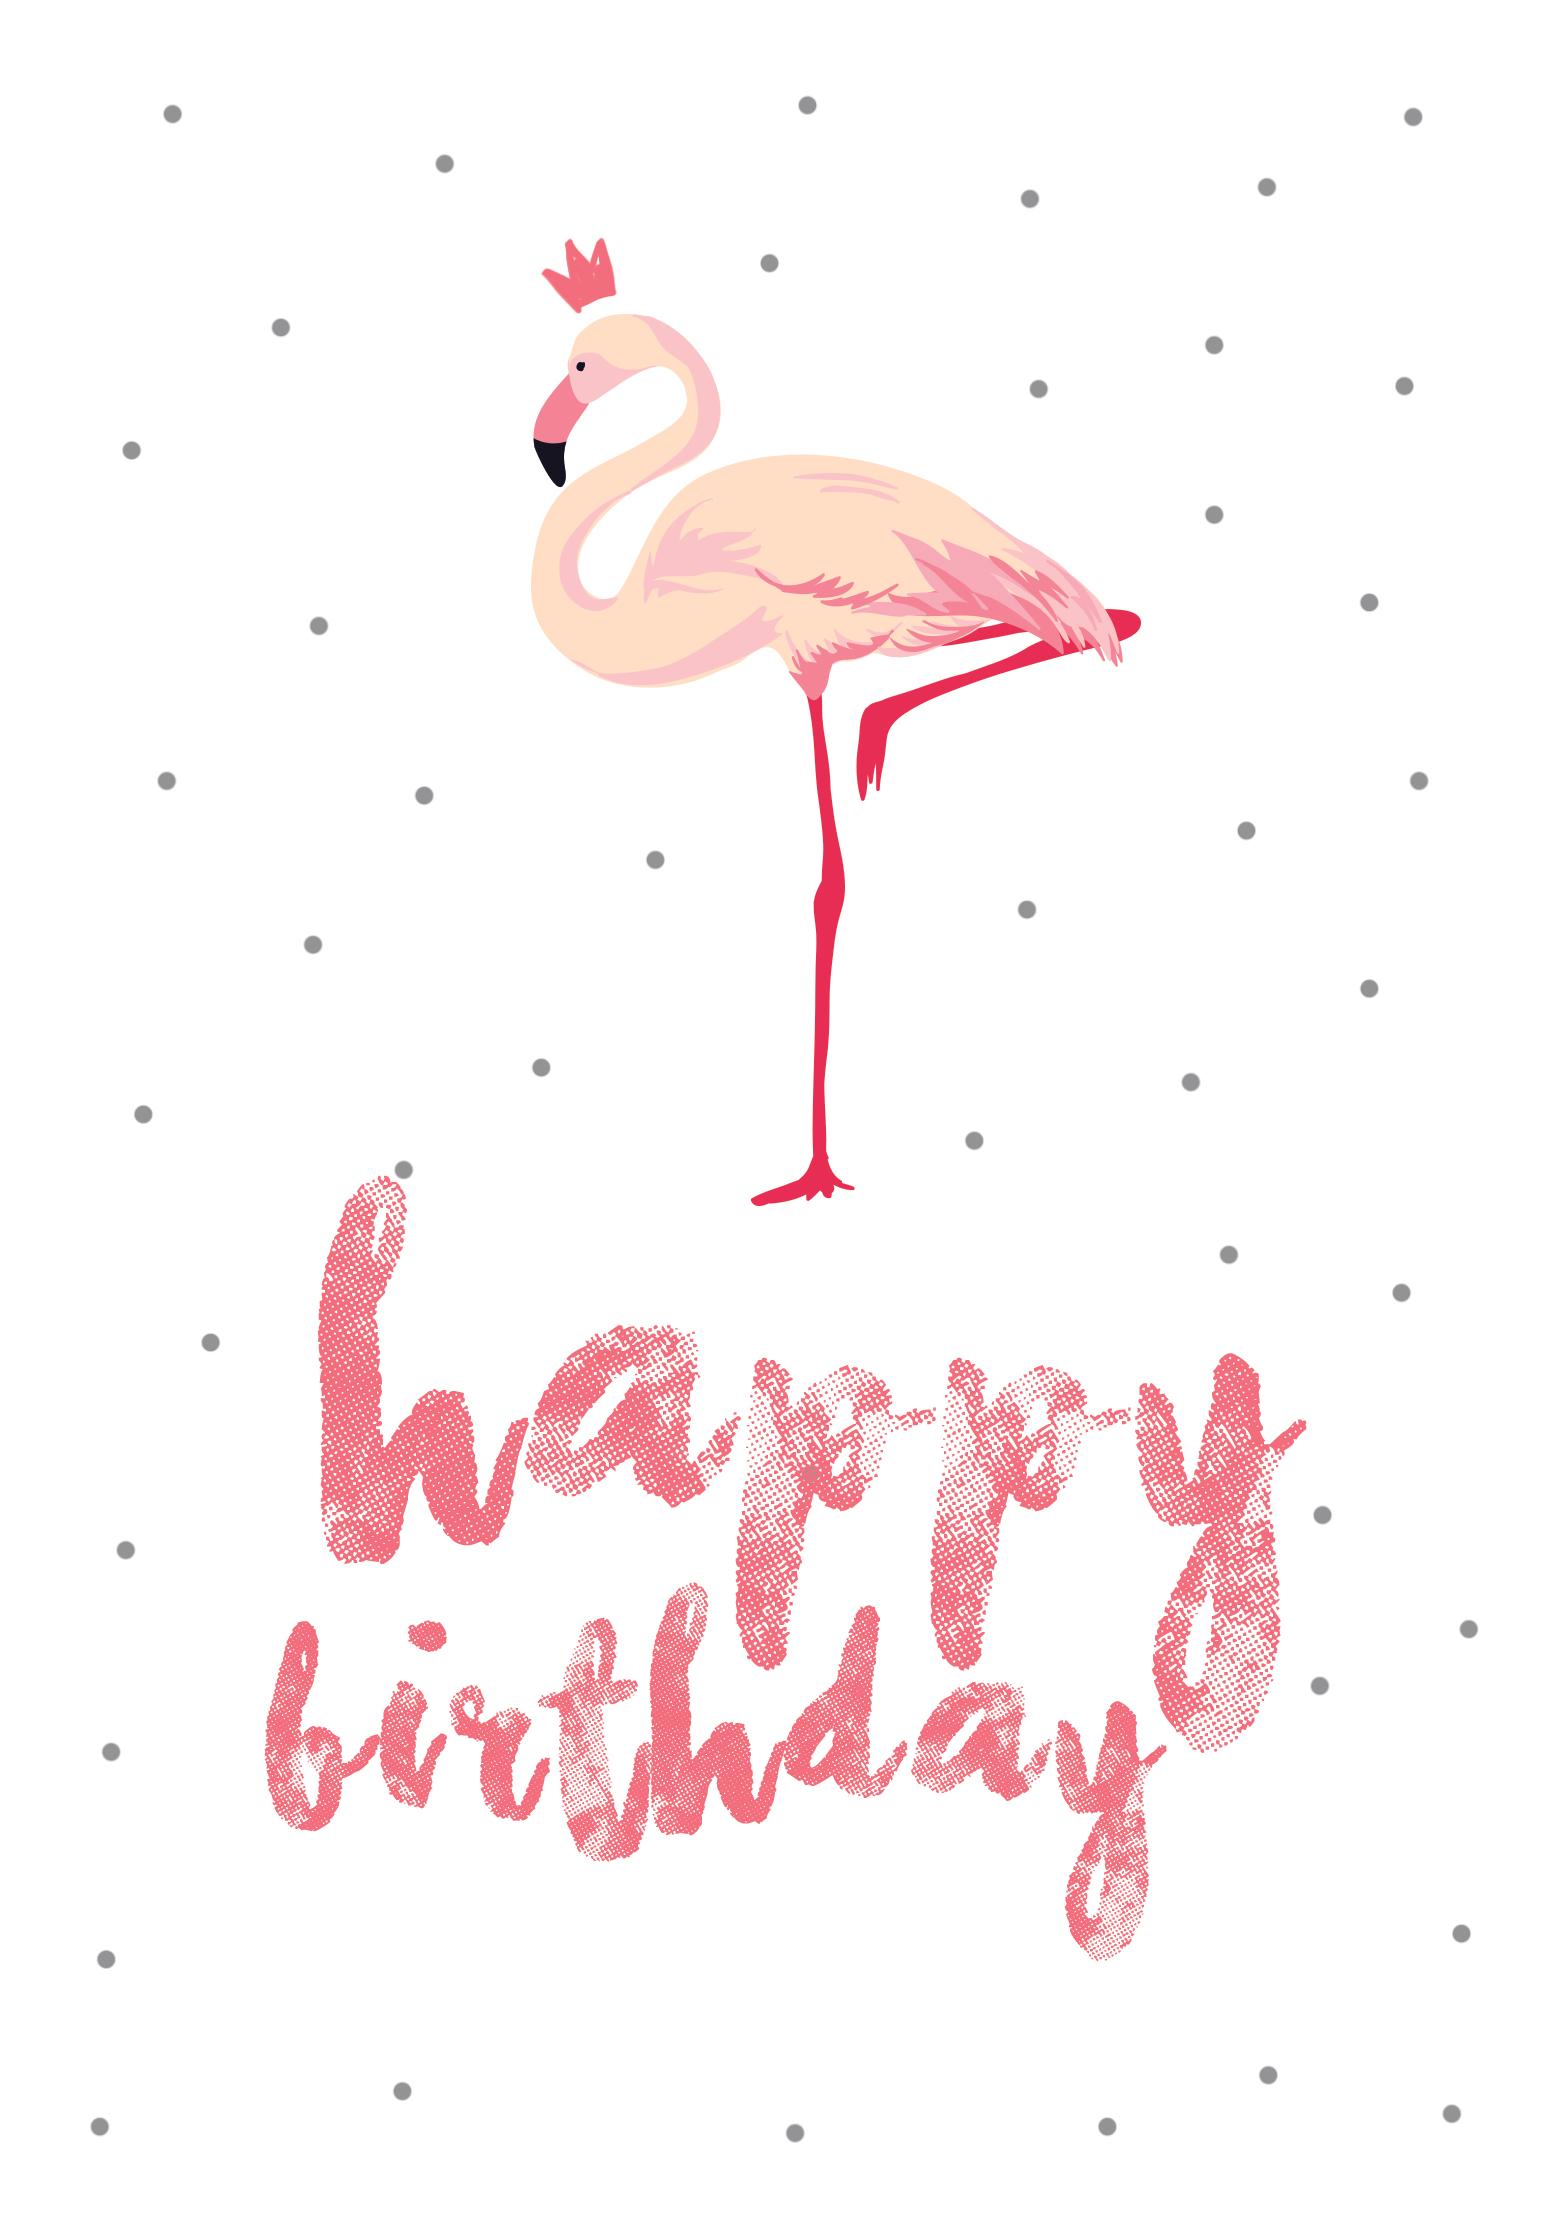 Flamingo Birthday - Free Printable Birthday Card | Greetings Island - Free Printable Thinking Of You Cards